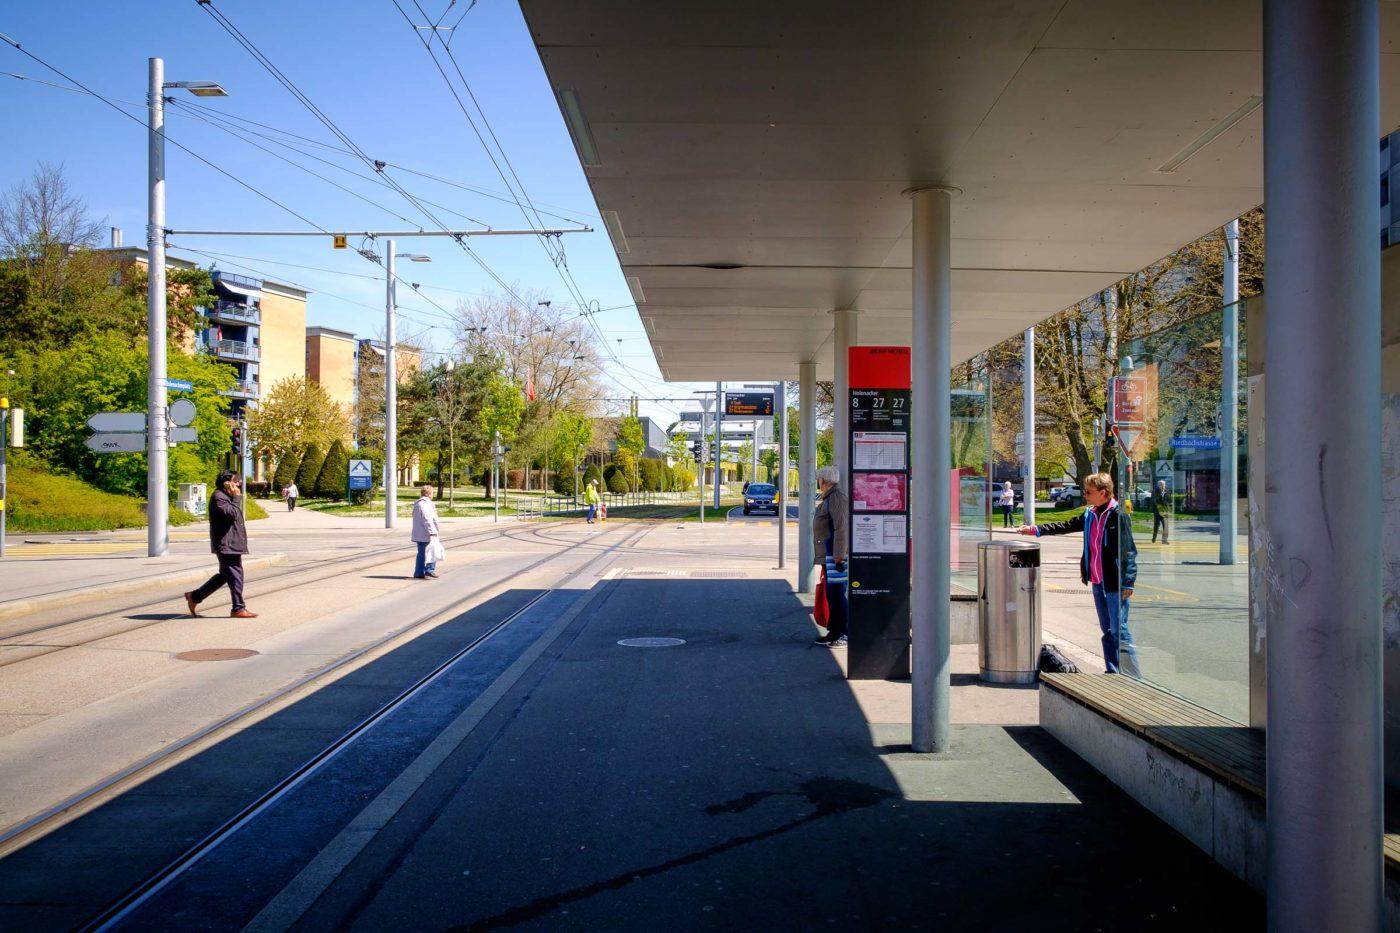 Holenacker (line 8), Bern, Switzerland